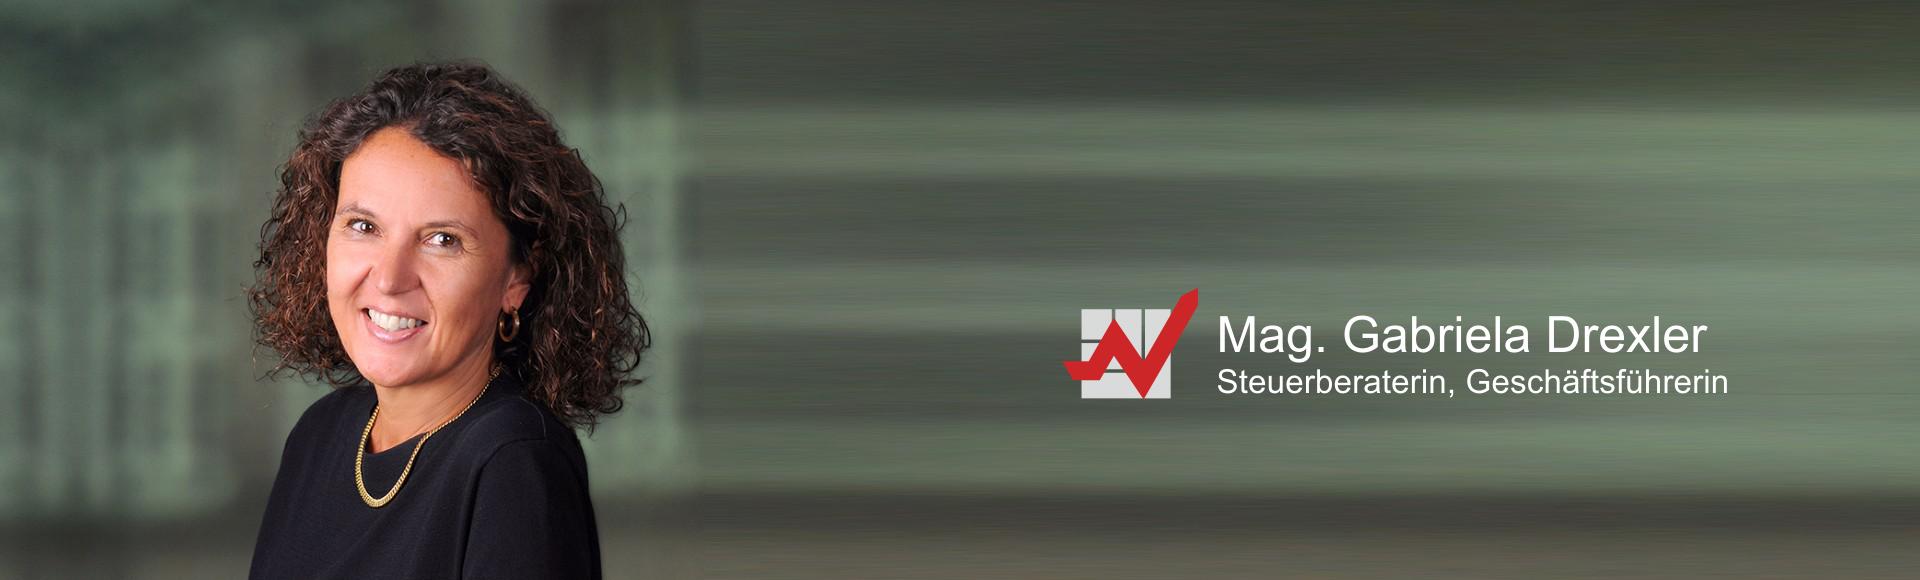 MDP_slide_mag_Drexler_Gabriela